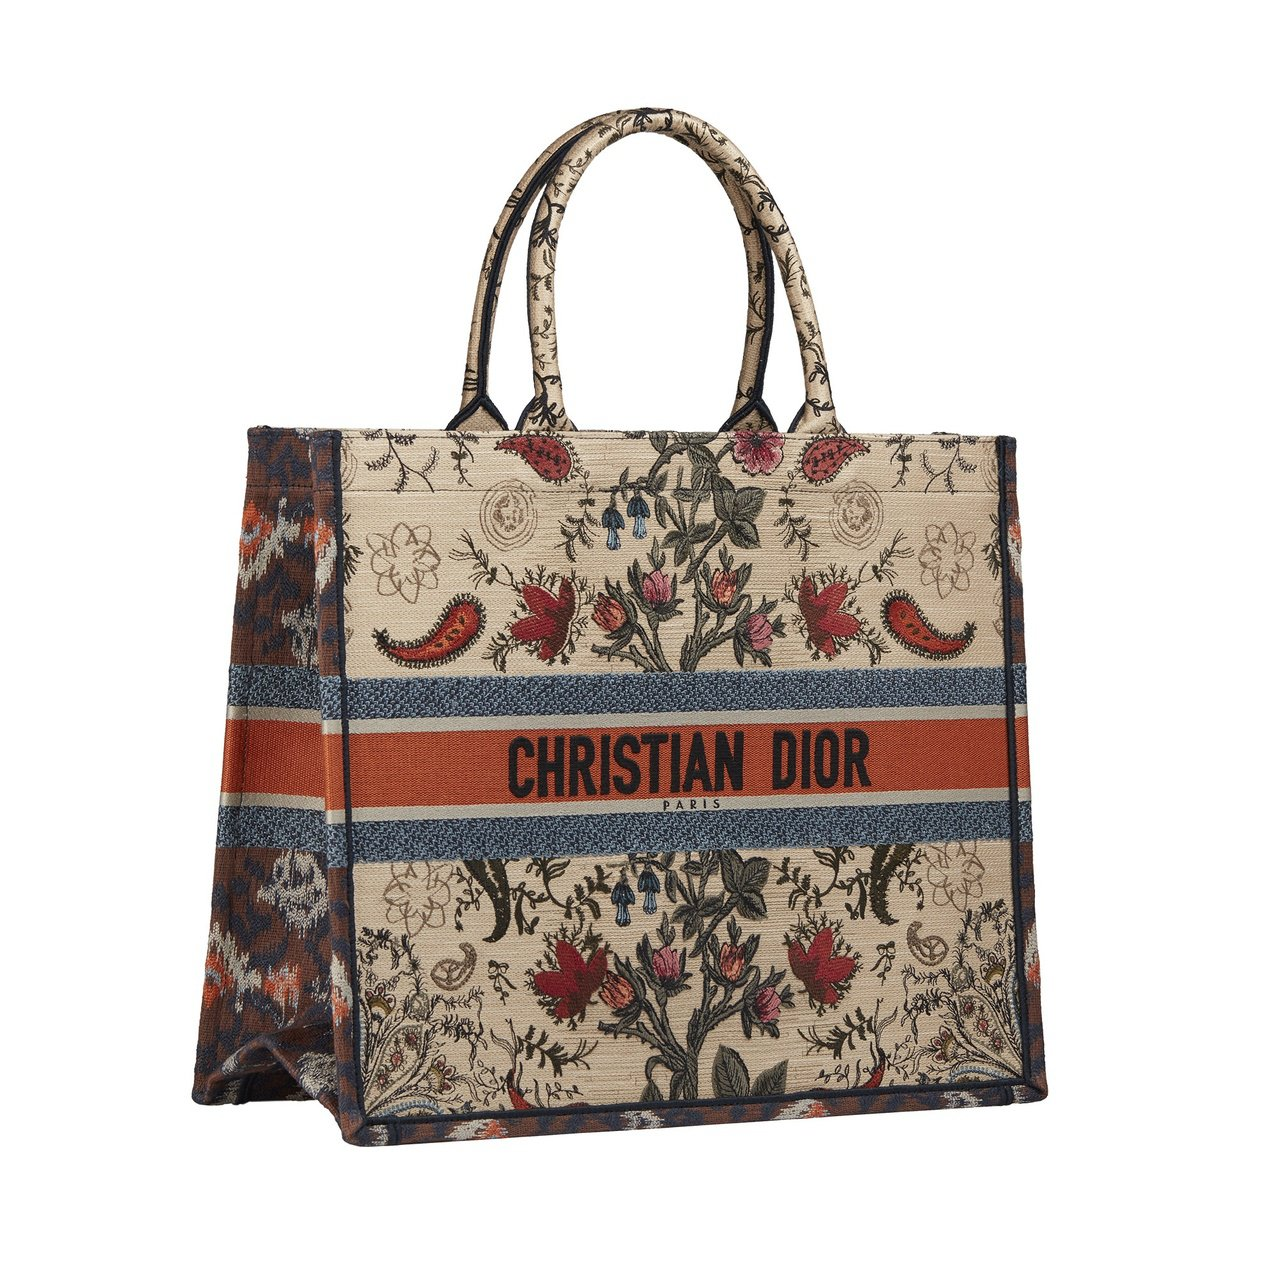 DIOR Book多彩花卉刺繡托特包,11萬元。 圖/DIOR提供